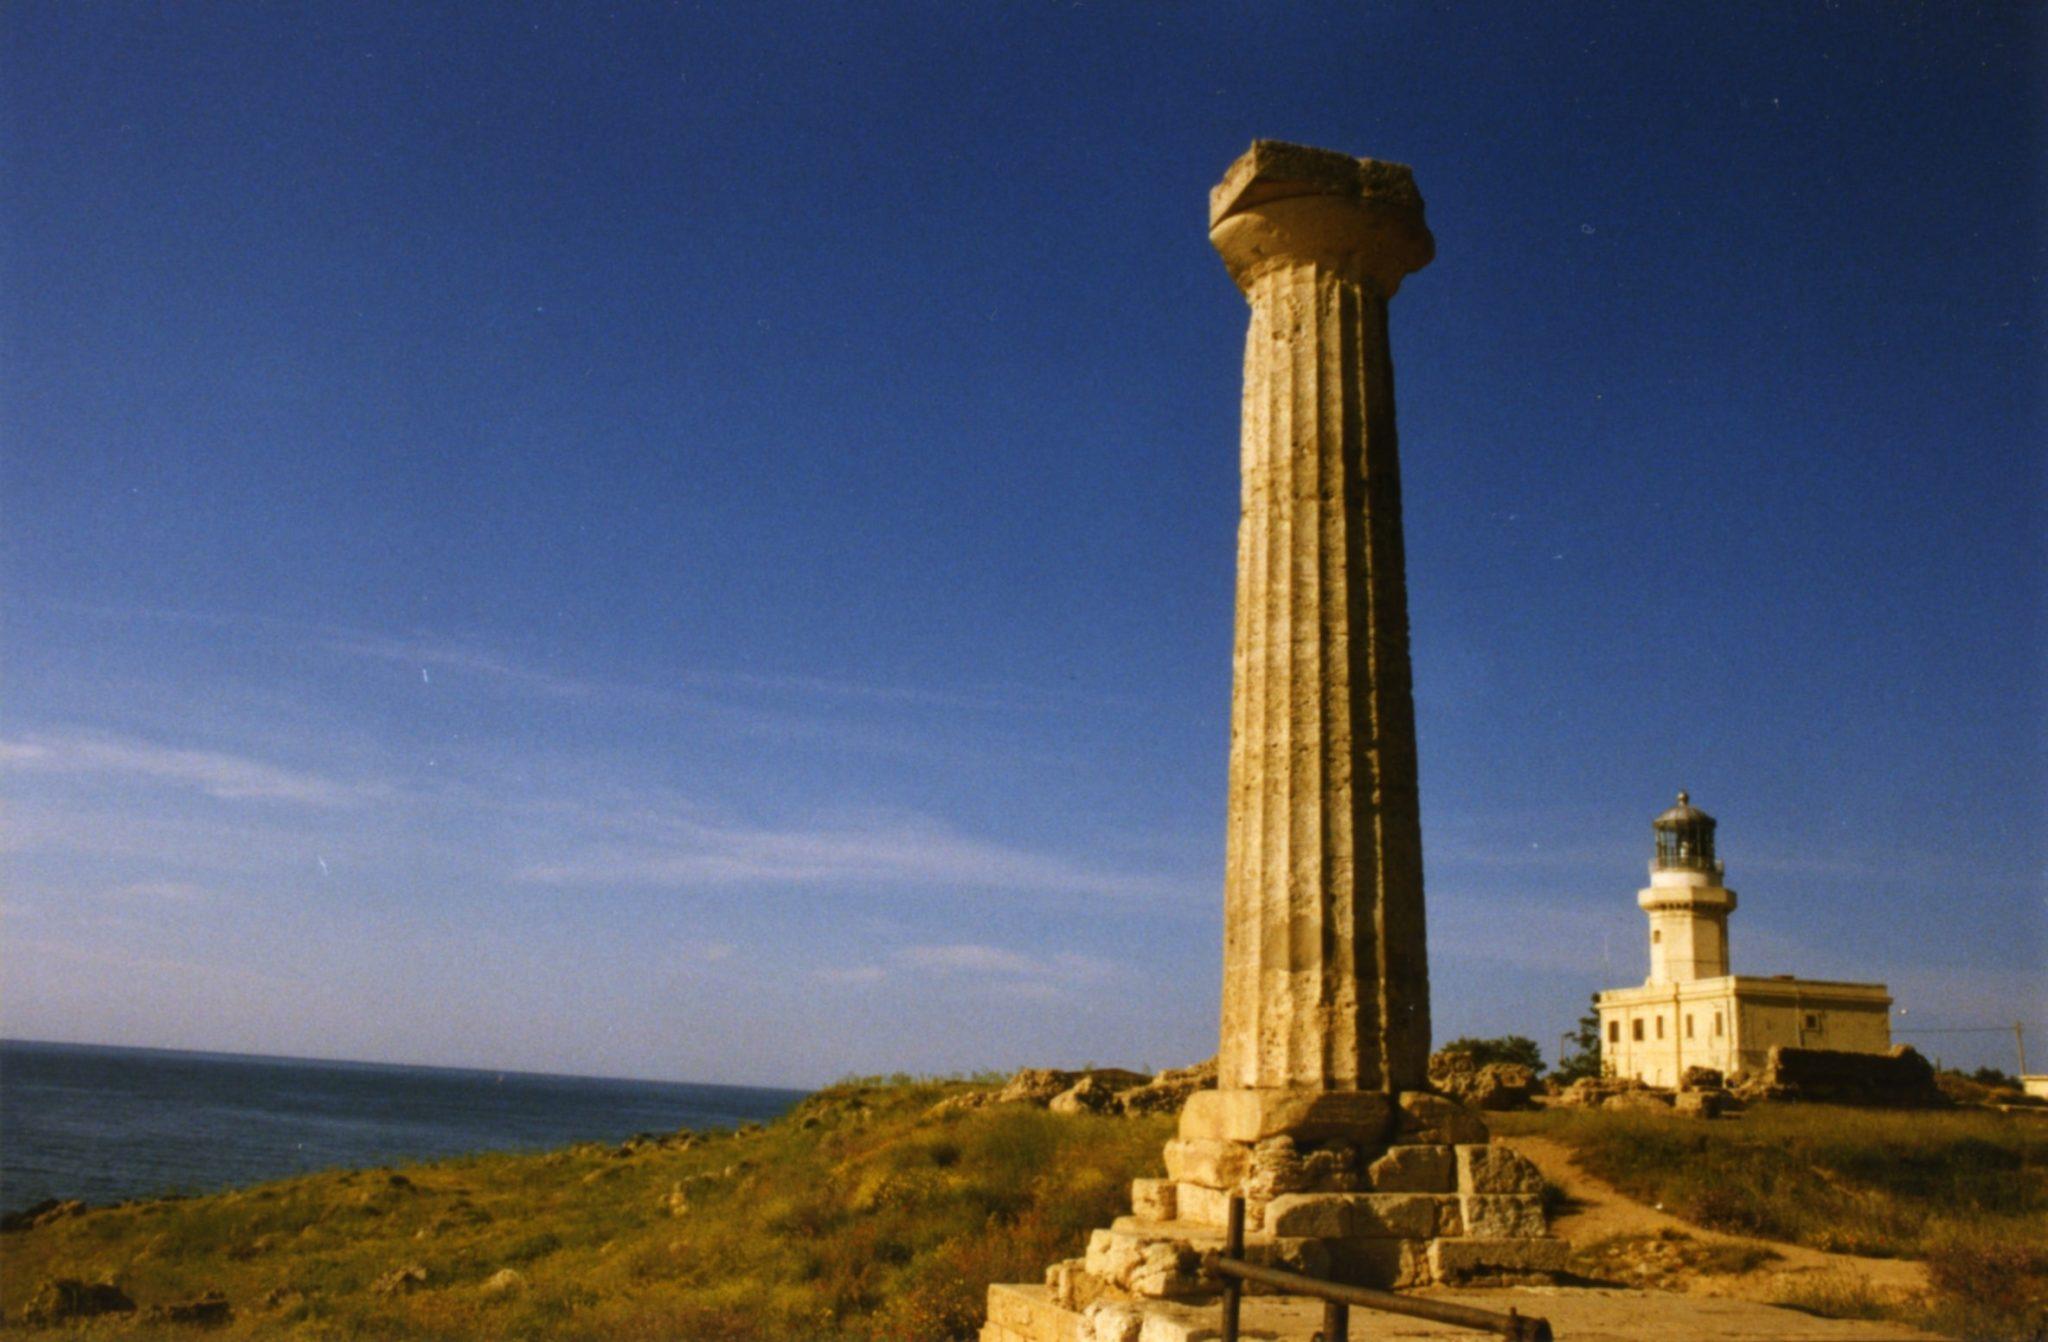 Parco archeologico di capo colonna yes calabria for Casa moderna crotone